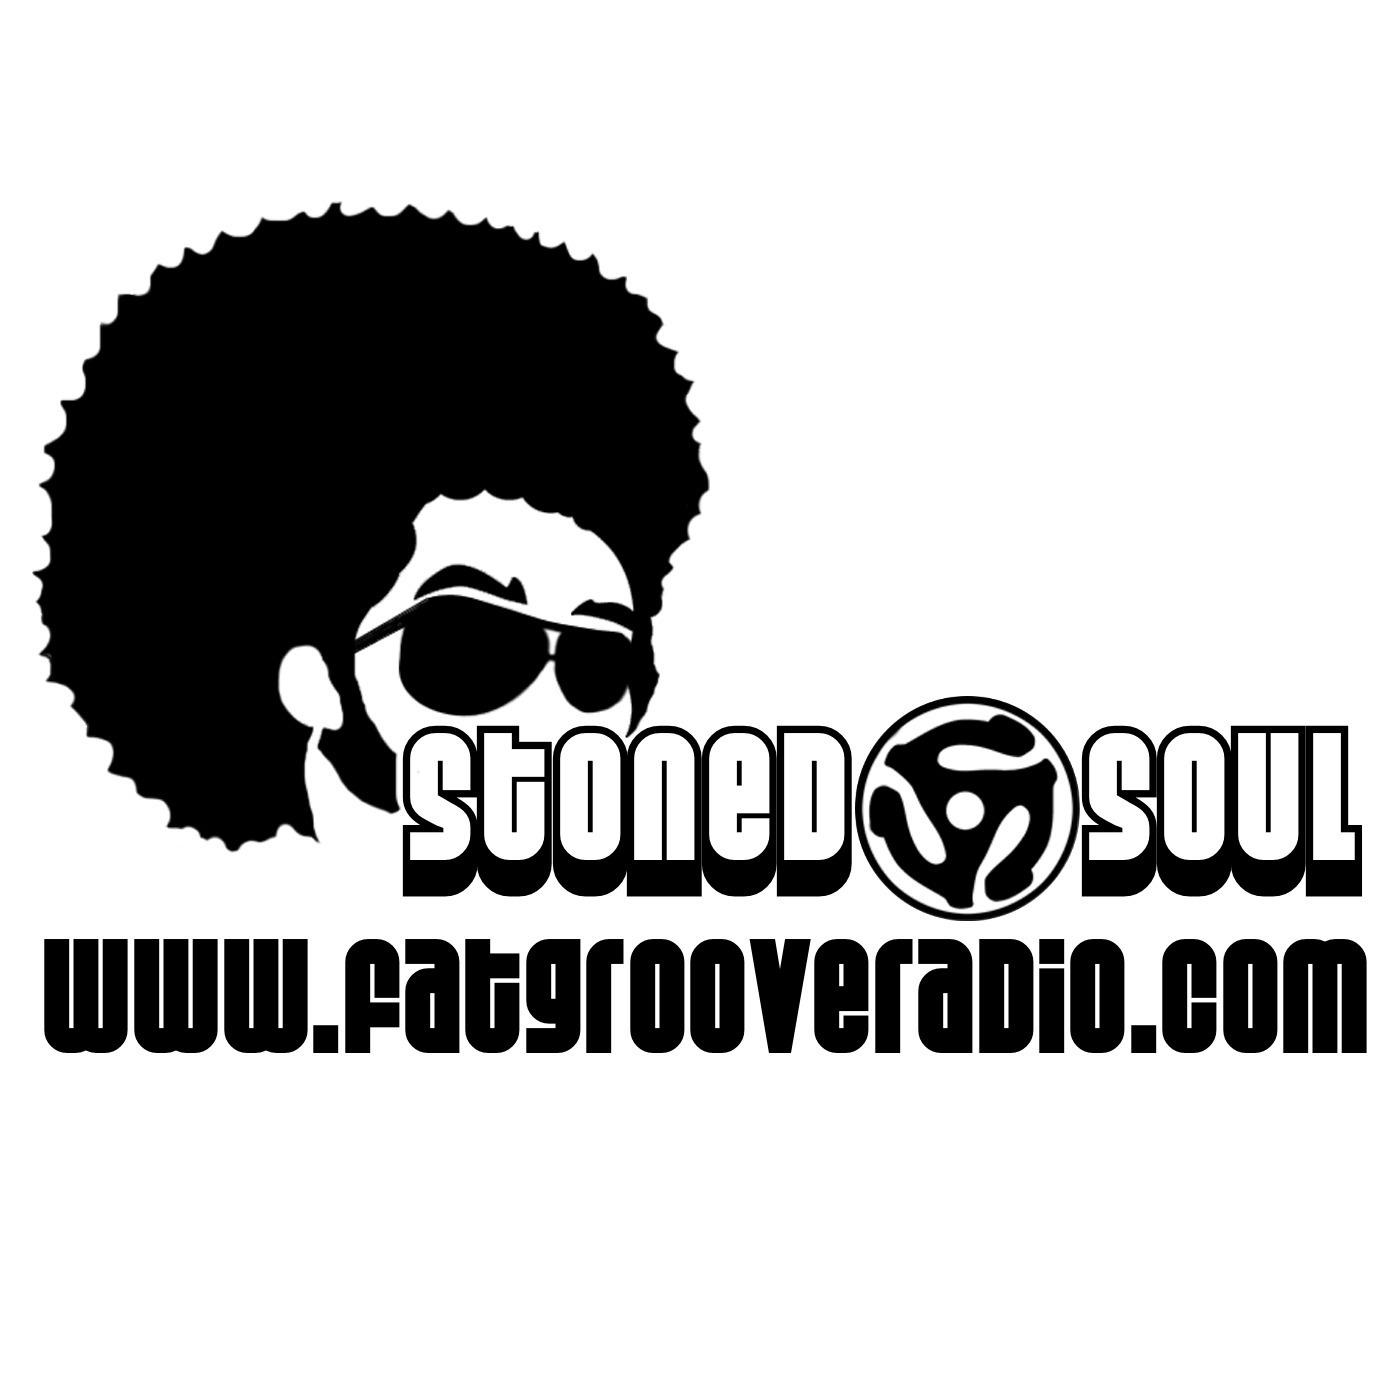 Stoned Soul Show FatGrooveRadio.com